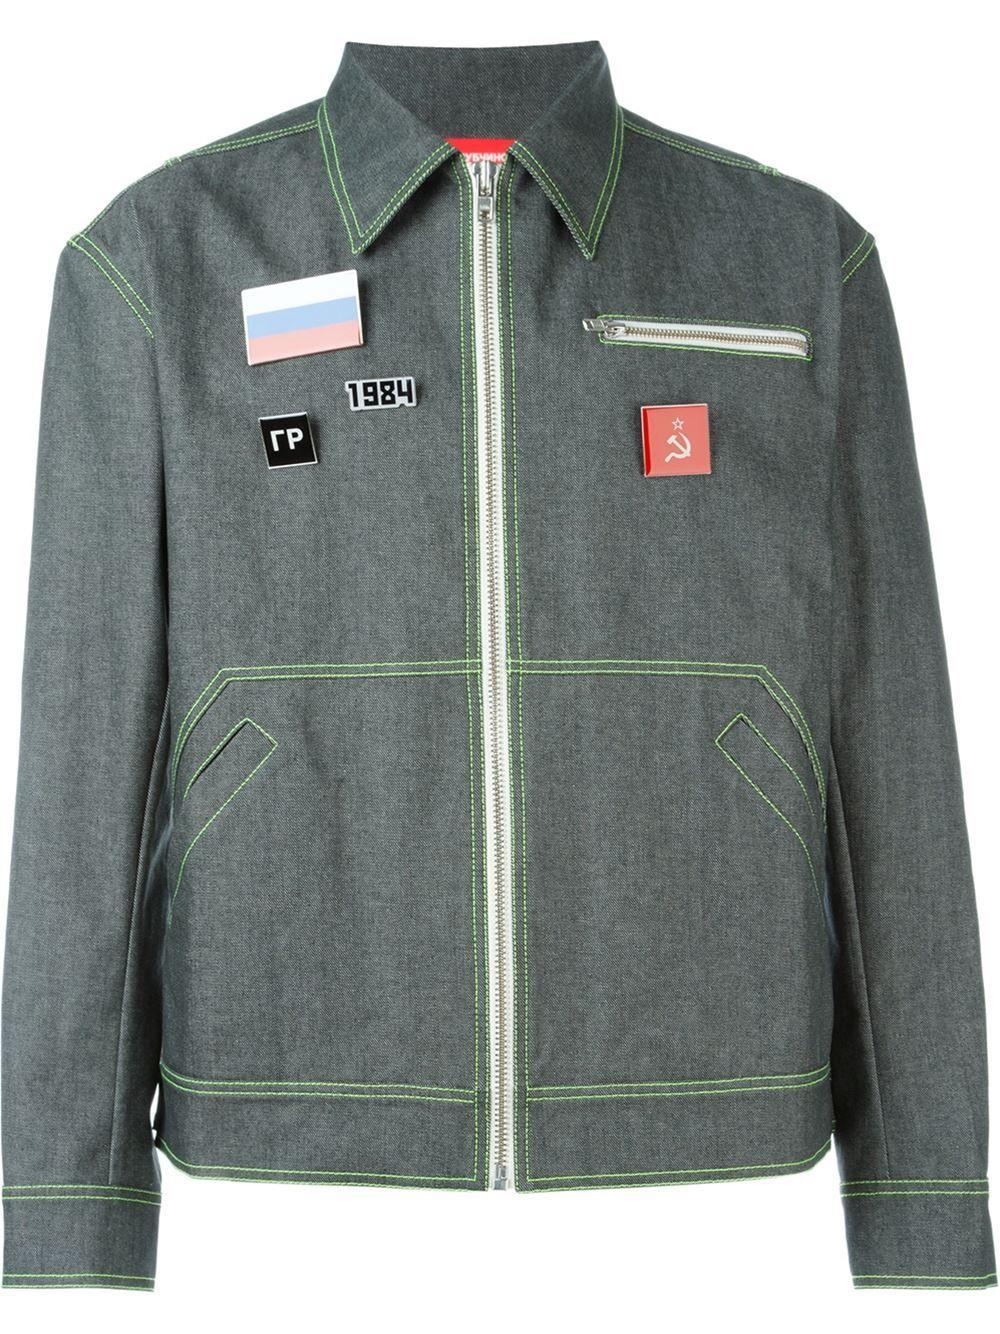 4c6b19349d24f Gosha Rubchinskiy Pin Detail Denim Zip Jacket in Grey from  Farfetch   GoshaRubchinskiy  DenimZipJacket